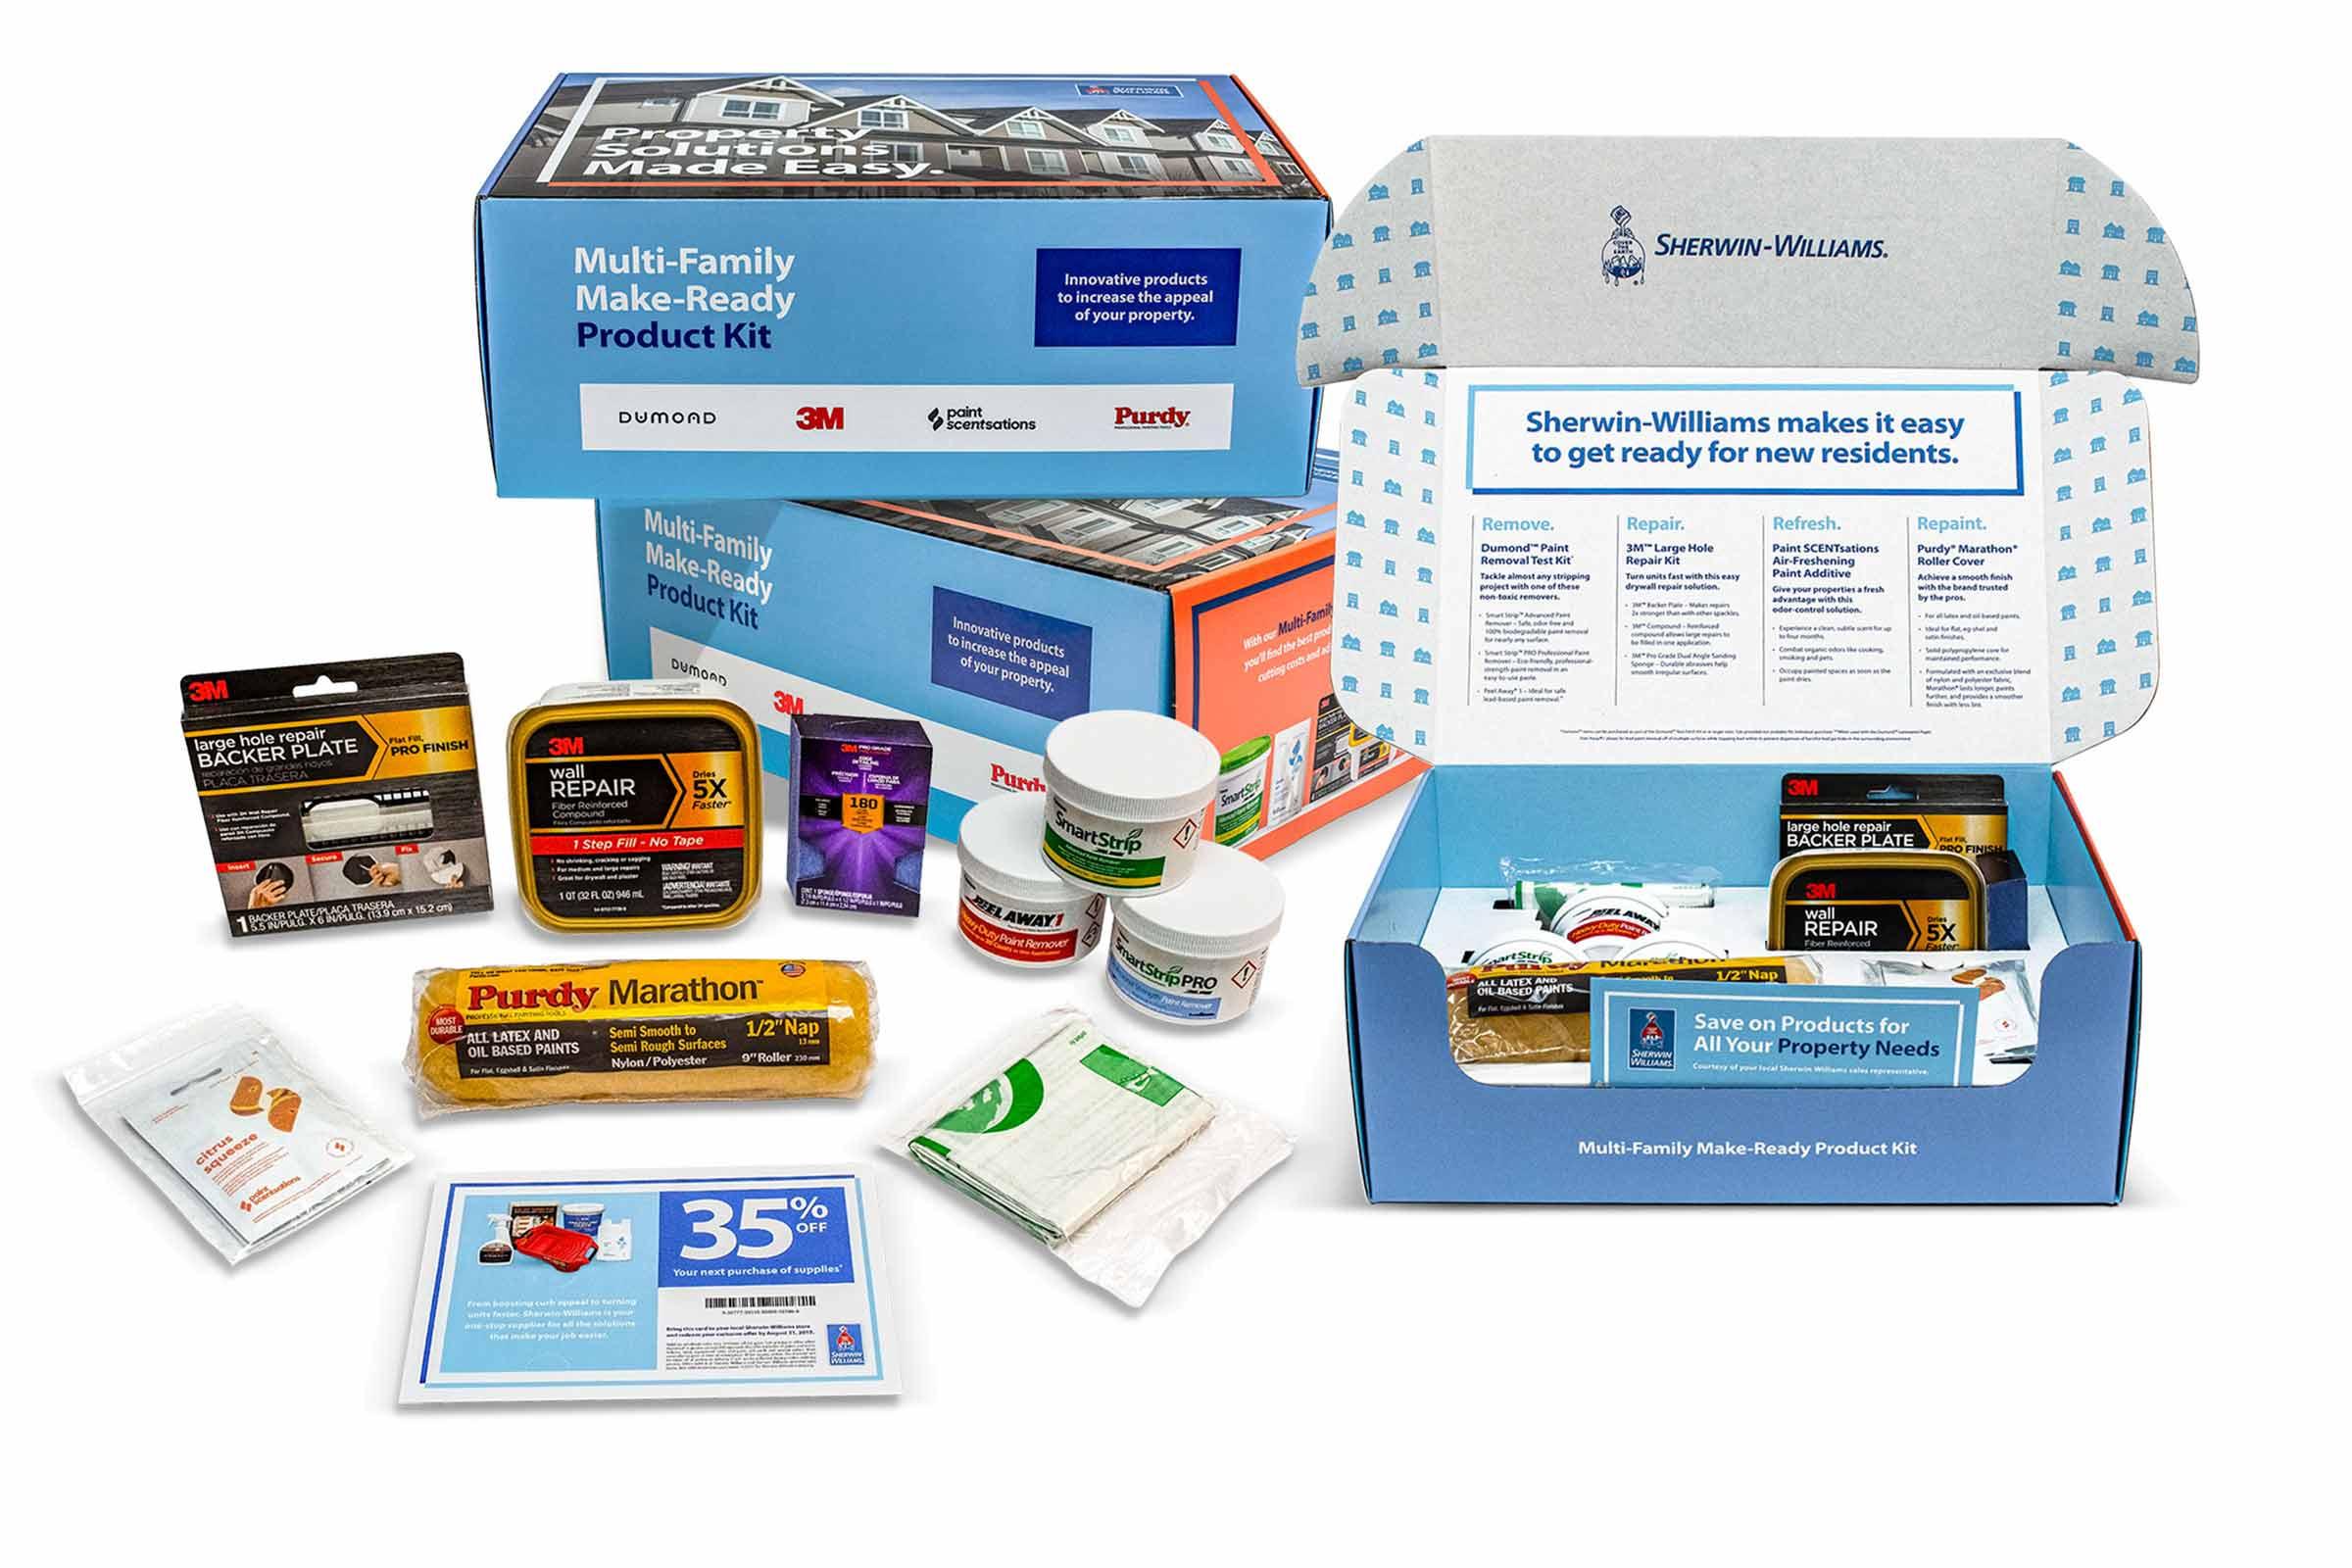 SW-MultiFamily-Kit